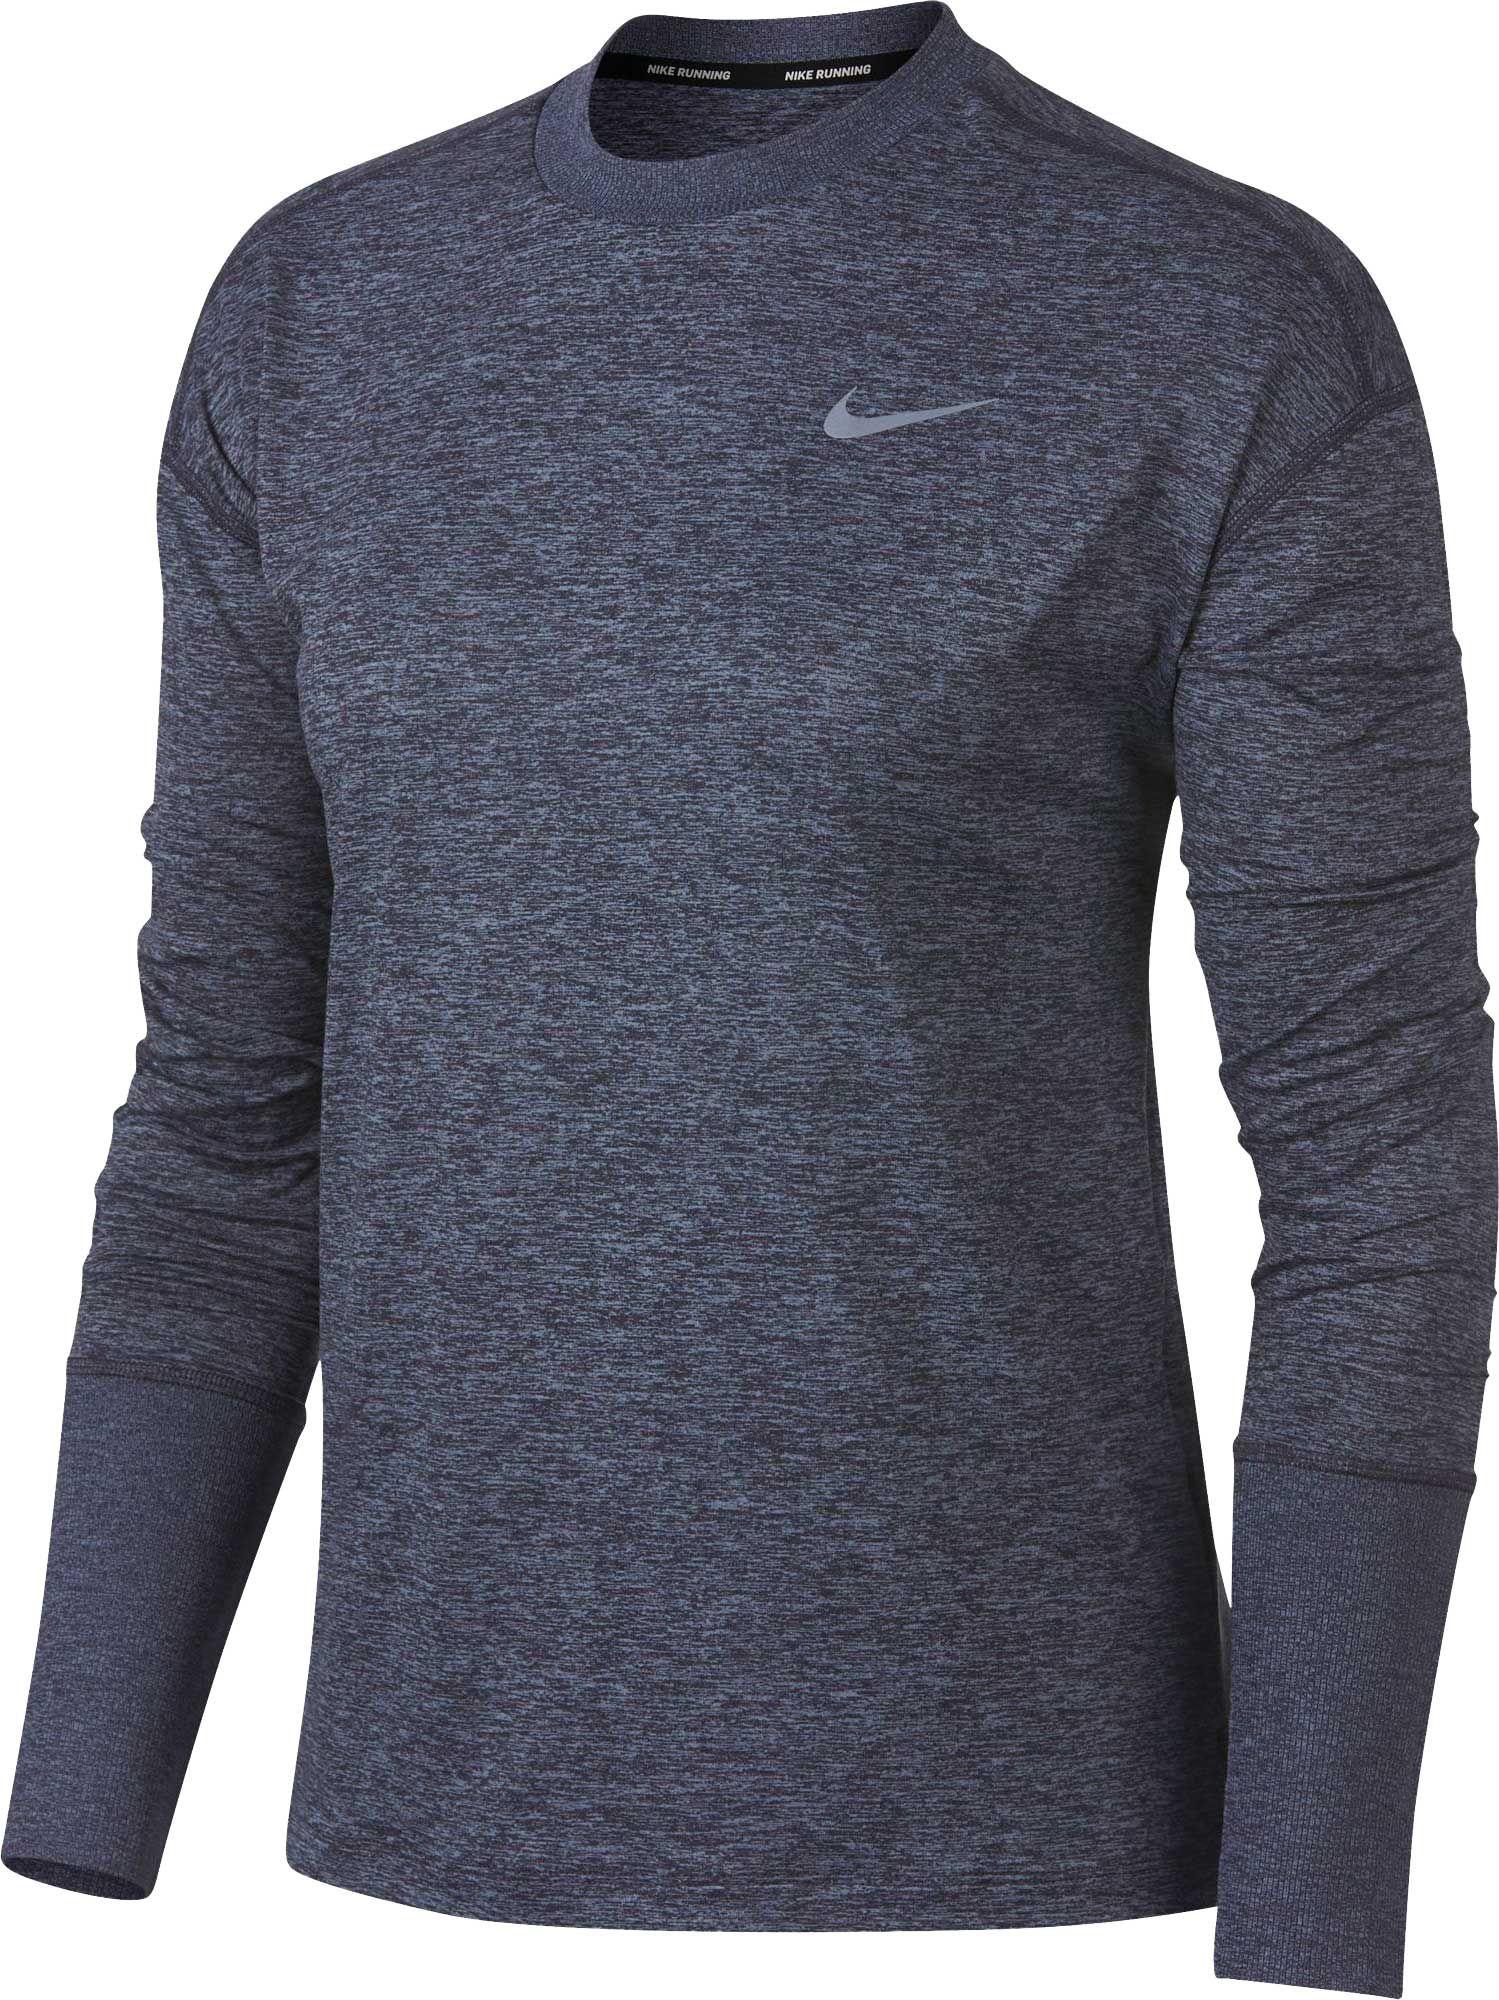 40+ Nike long sleeve shirt womens ideas information